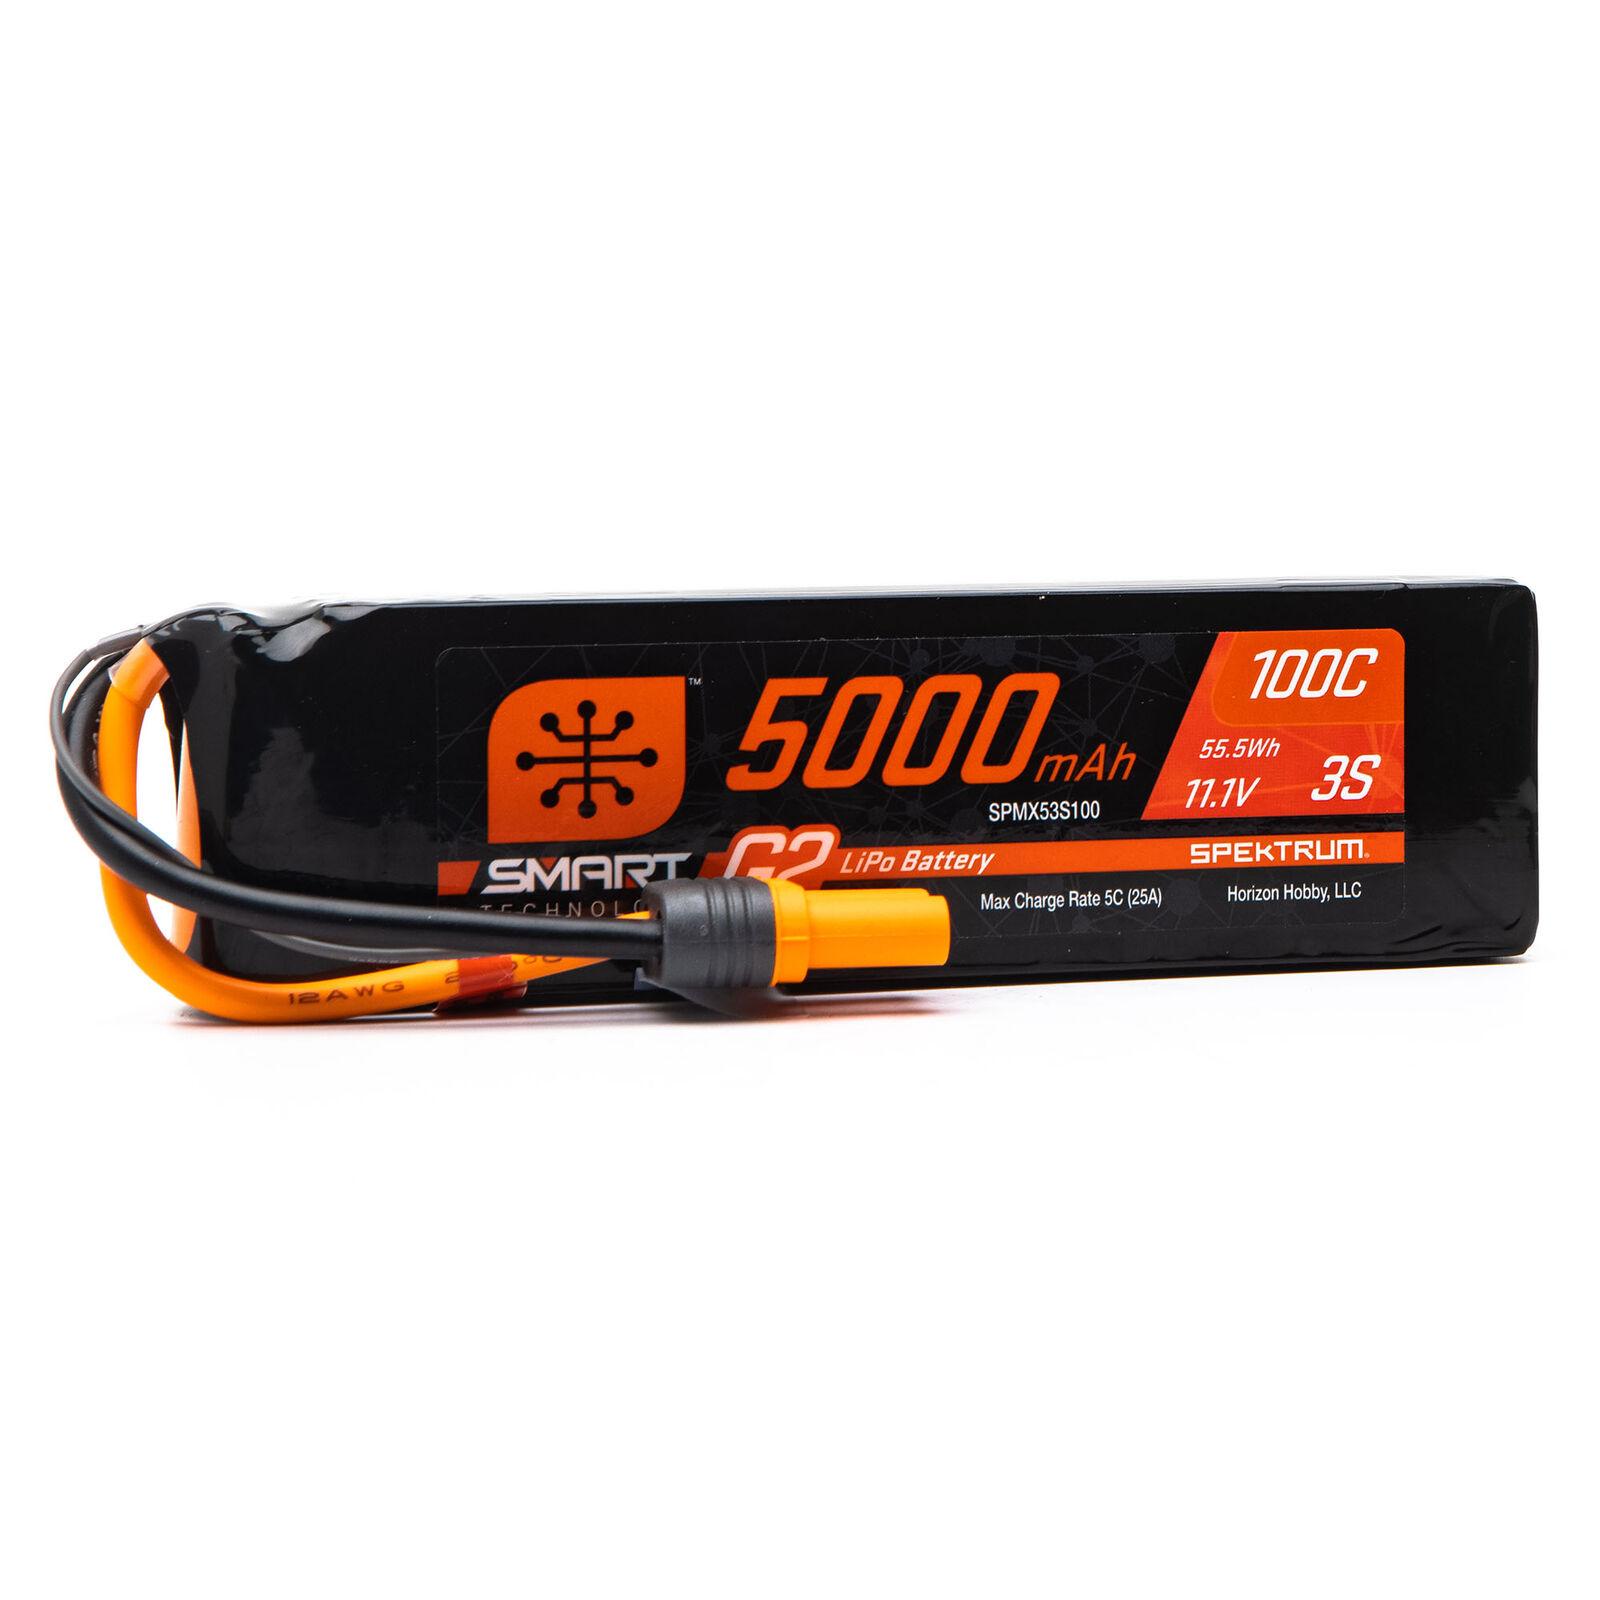 11.1V 5000mAh 3S 100C Smart G2 LiPo Battery: IC5